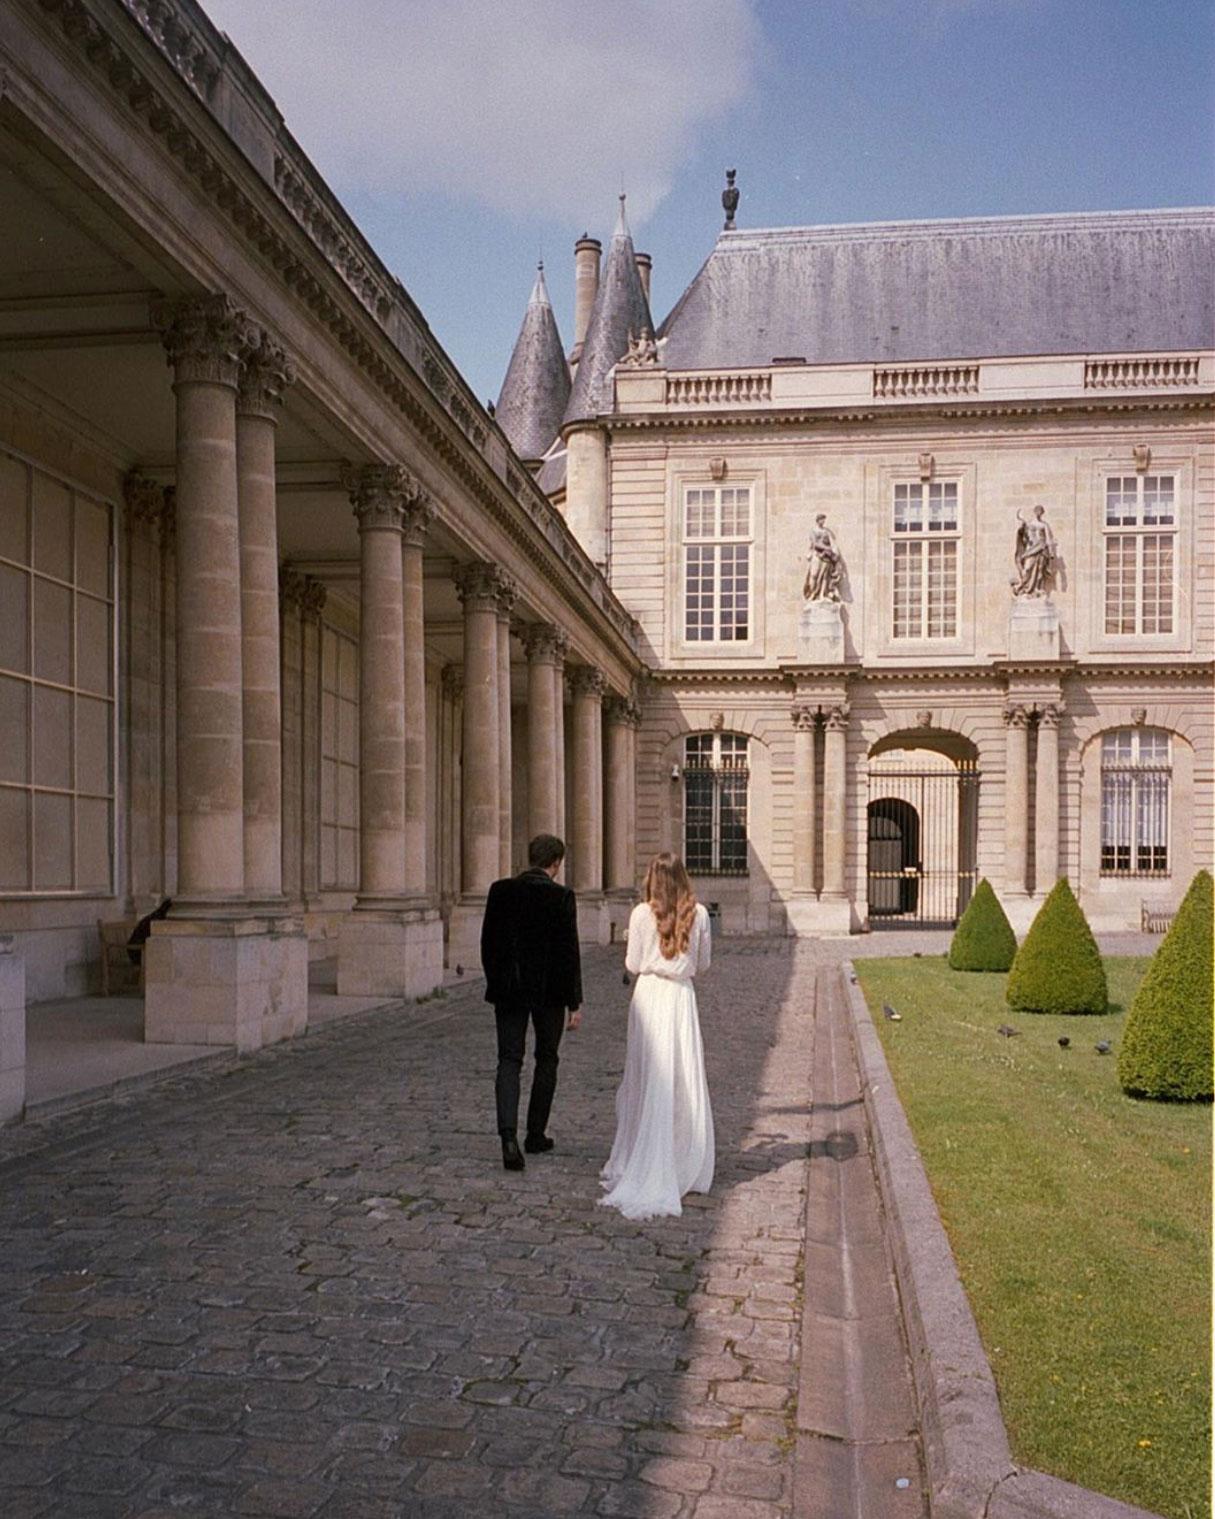 Phil-Chester-Sara-Byrne-Paris-Elopement-12.jpg